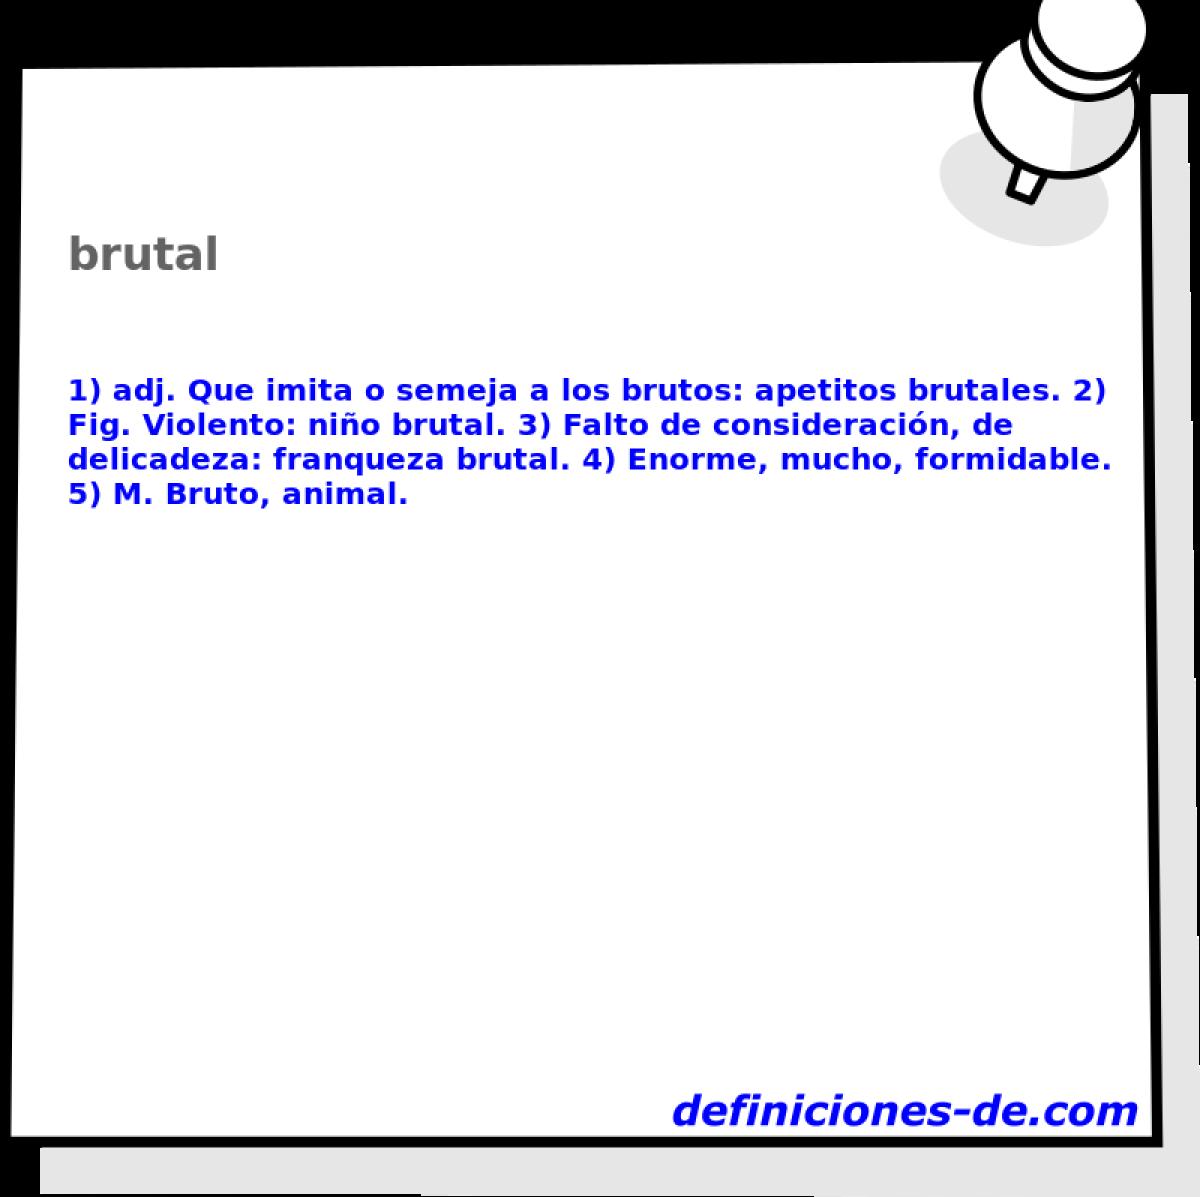 Qué significa Brutal?